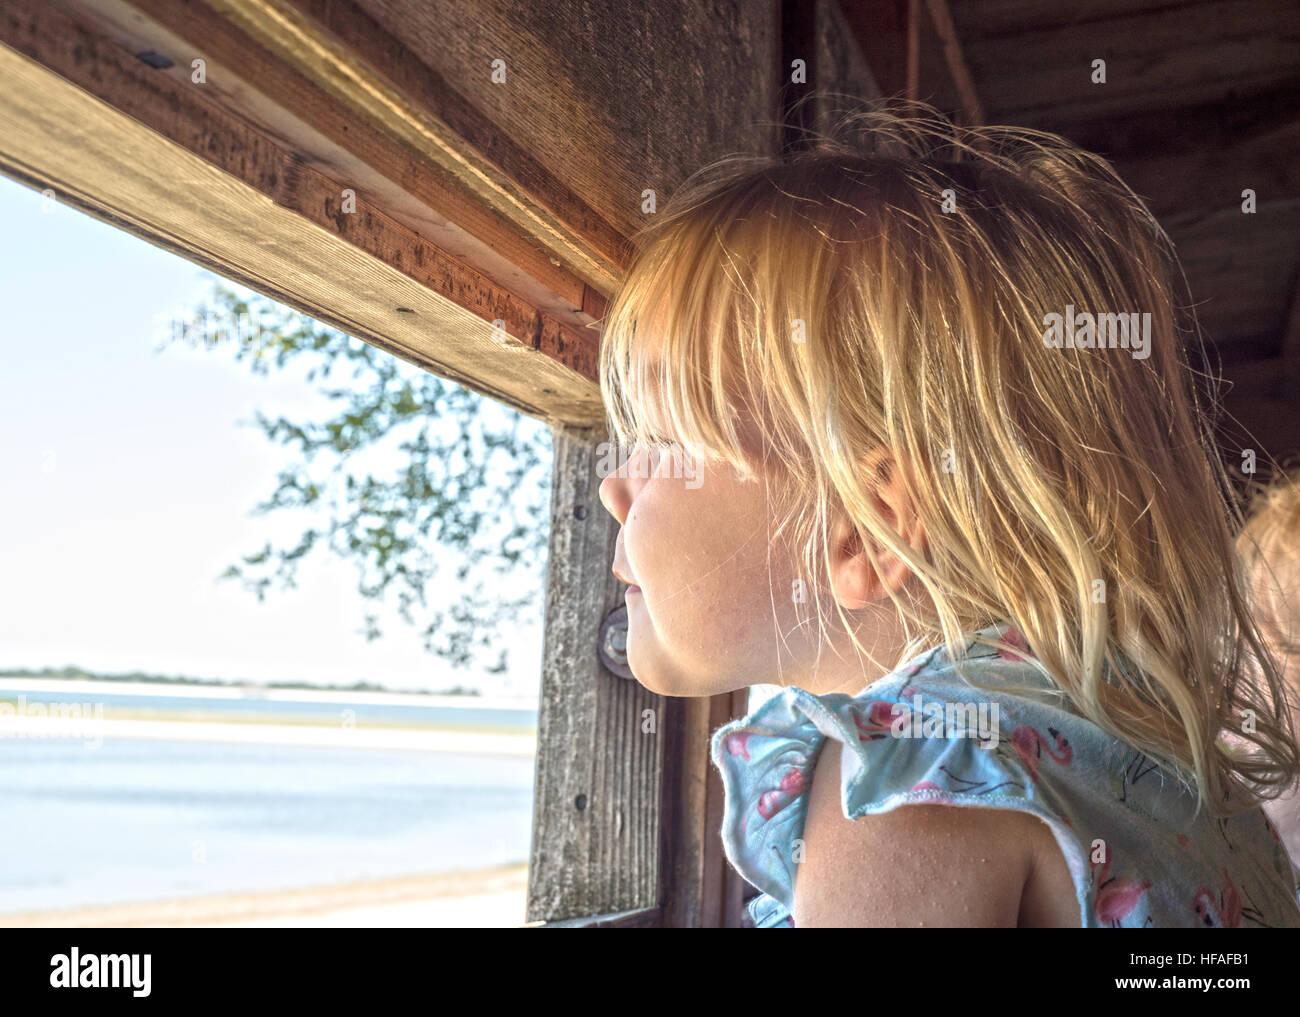 Lillie, Kind-Vogelbeobachtung Stockbild